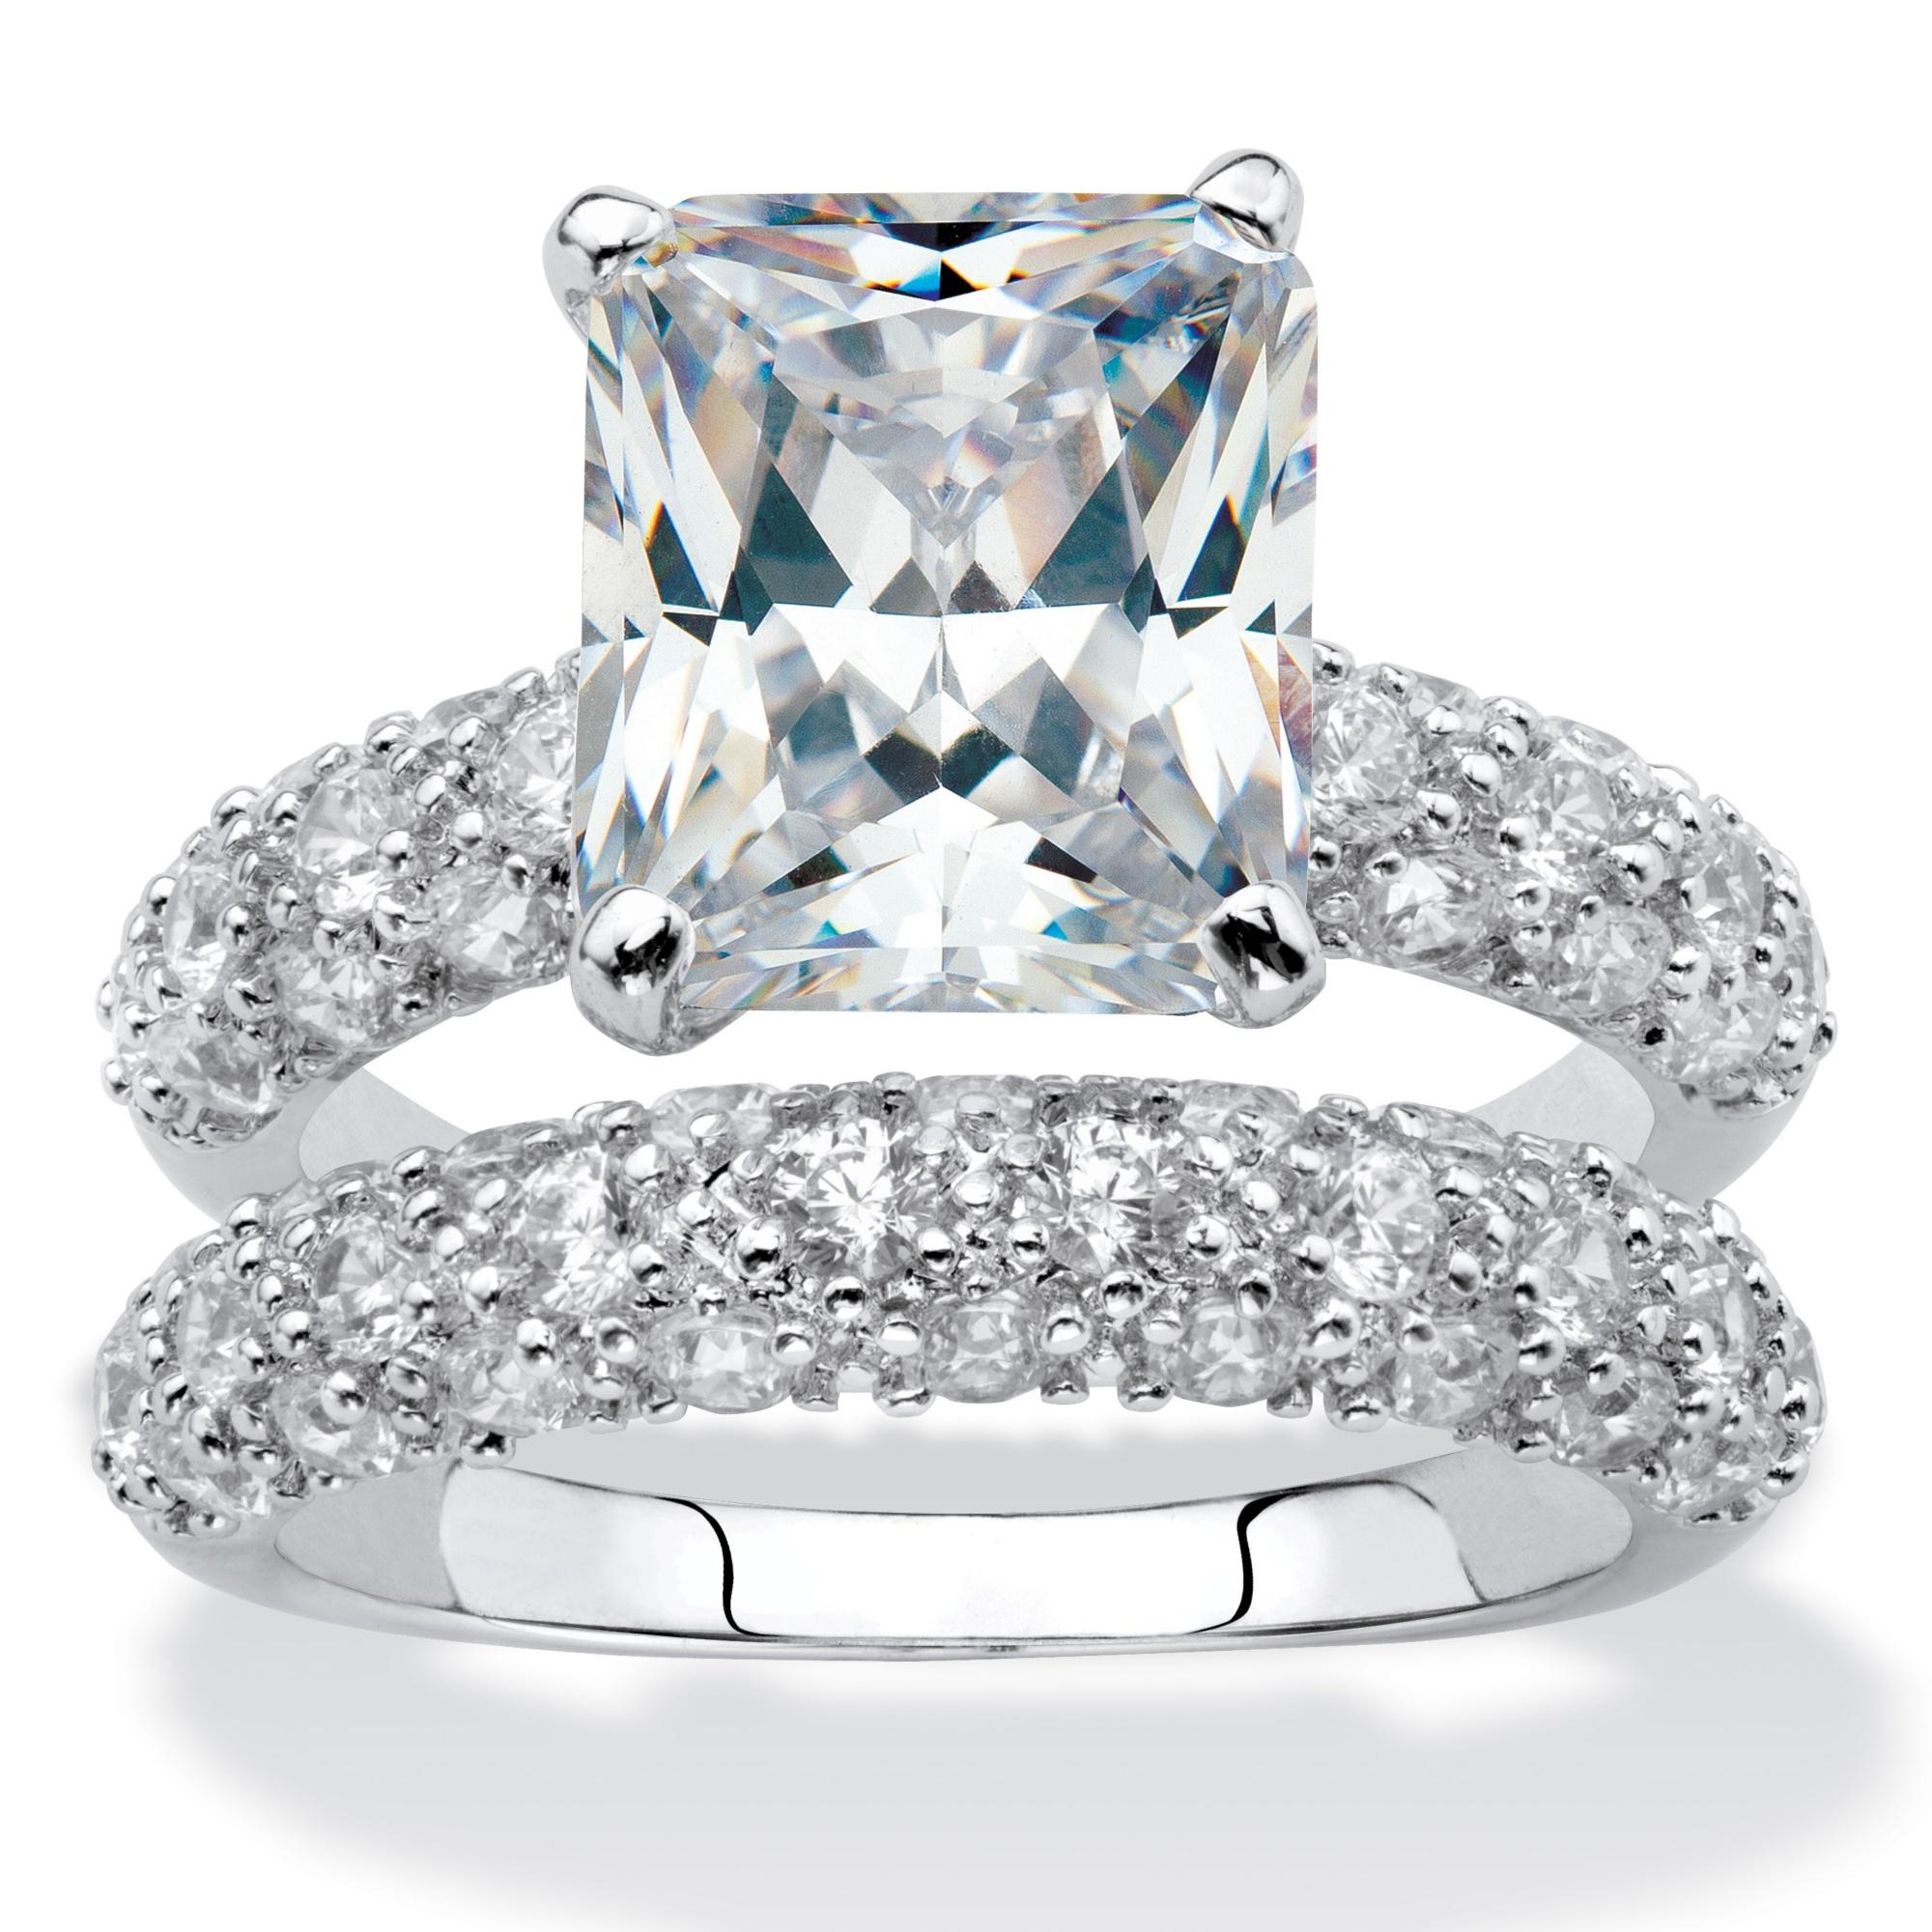 Wedding rings wedding ring sets cubic zirconia wedding rings